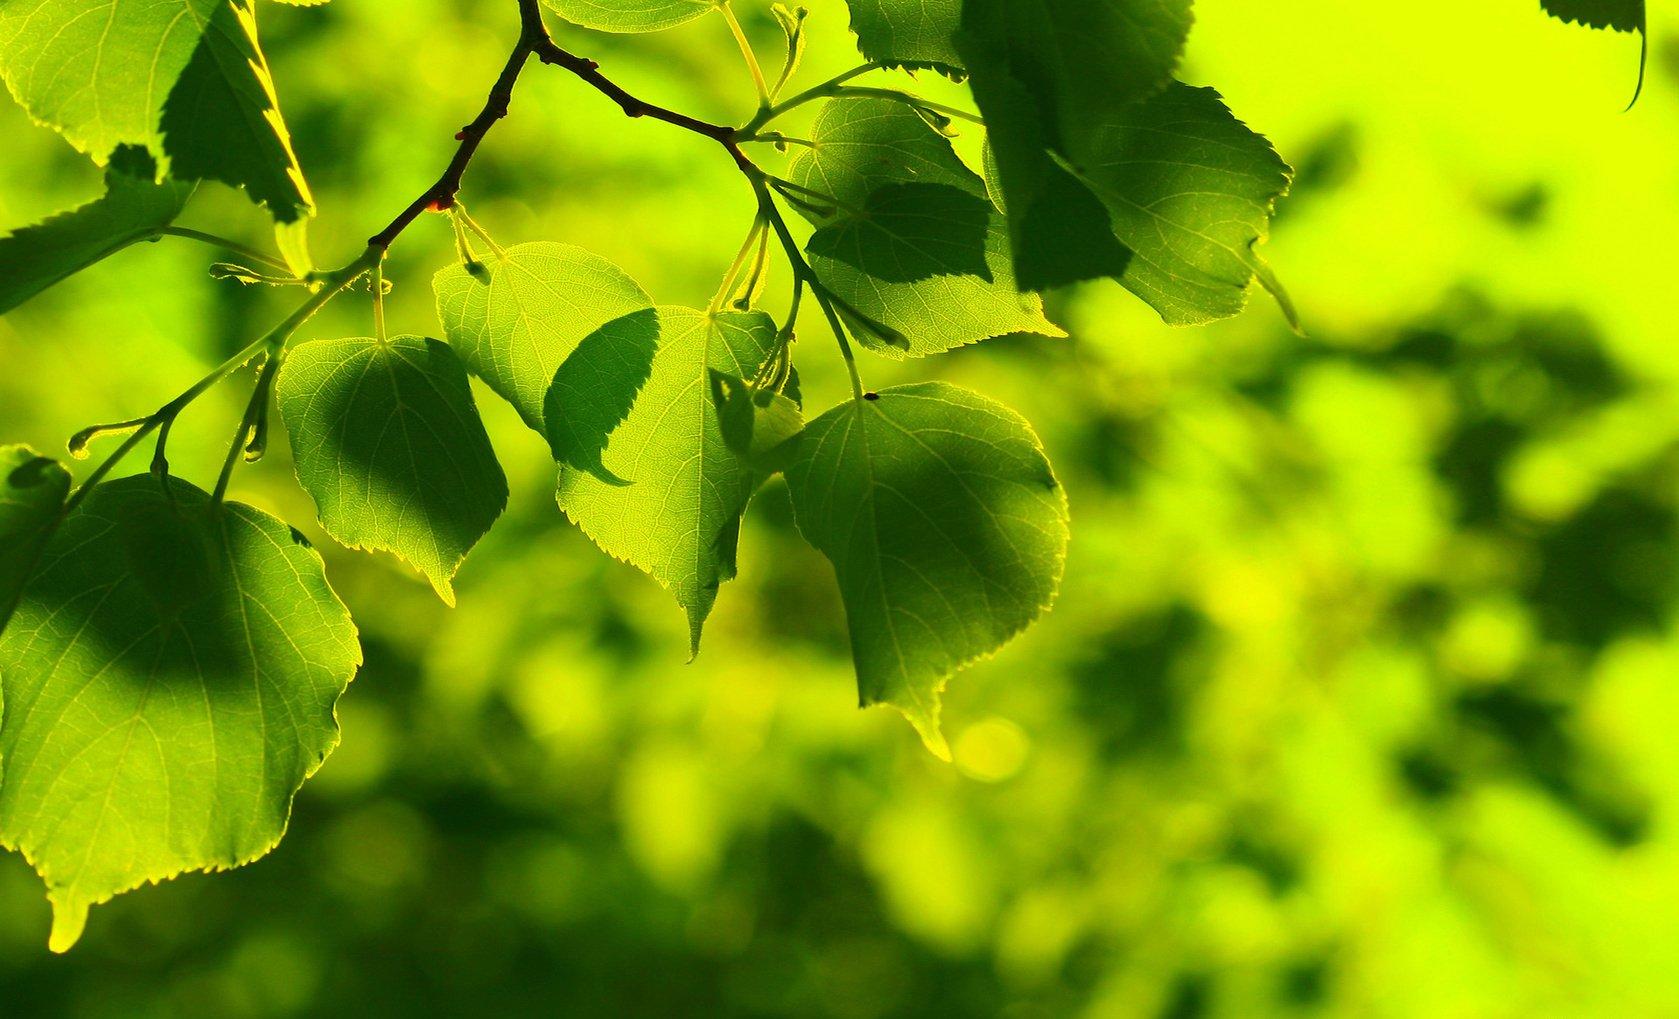 Tierra/Naturaleza - Hoja  Fondo de Pantalla